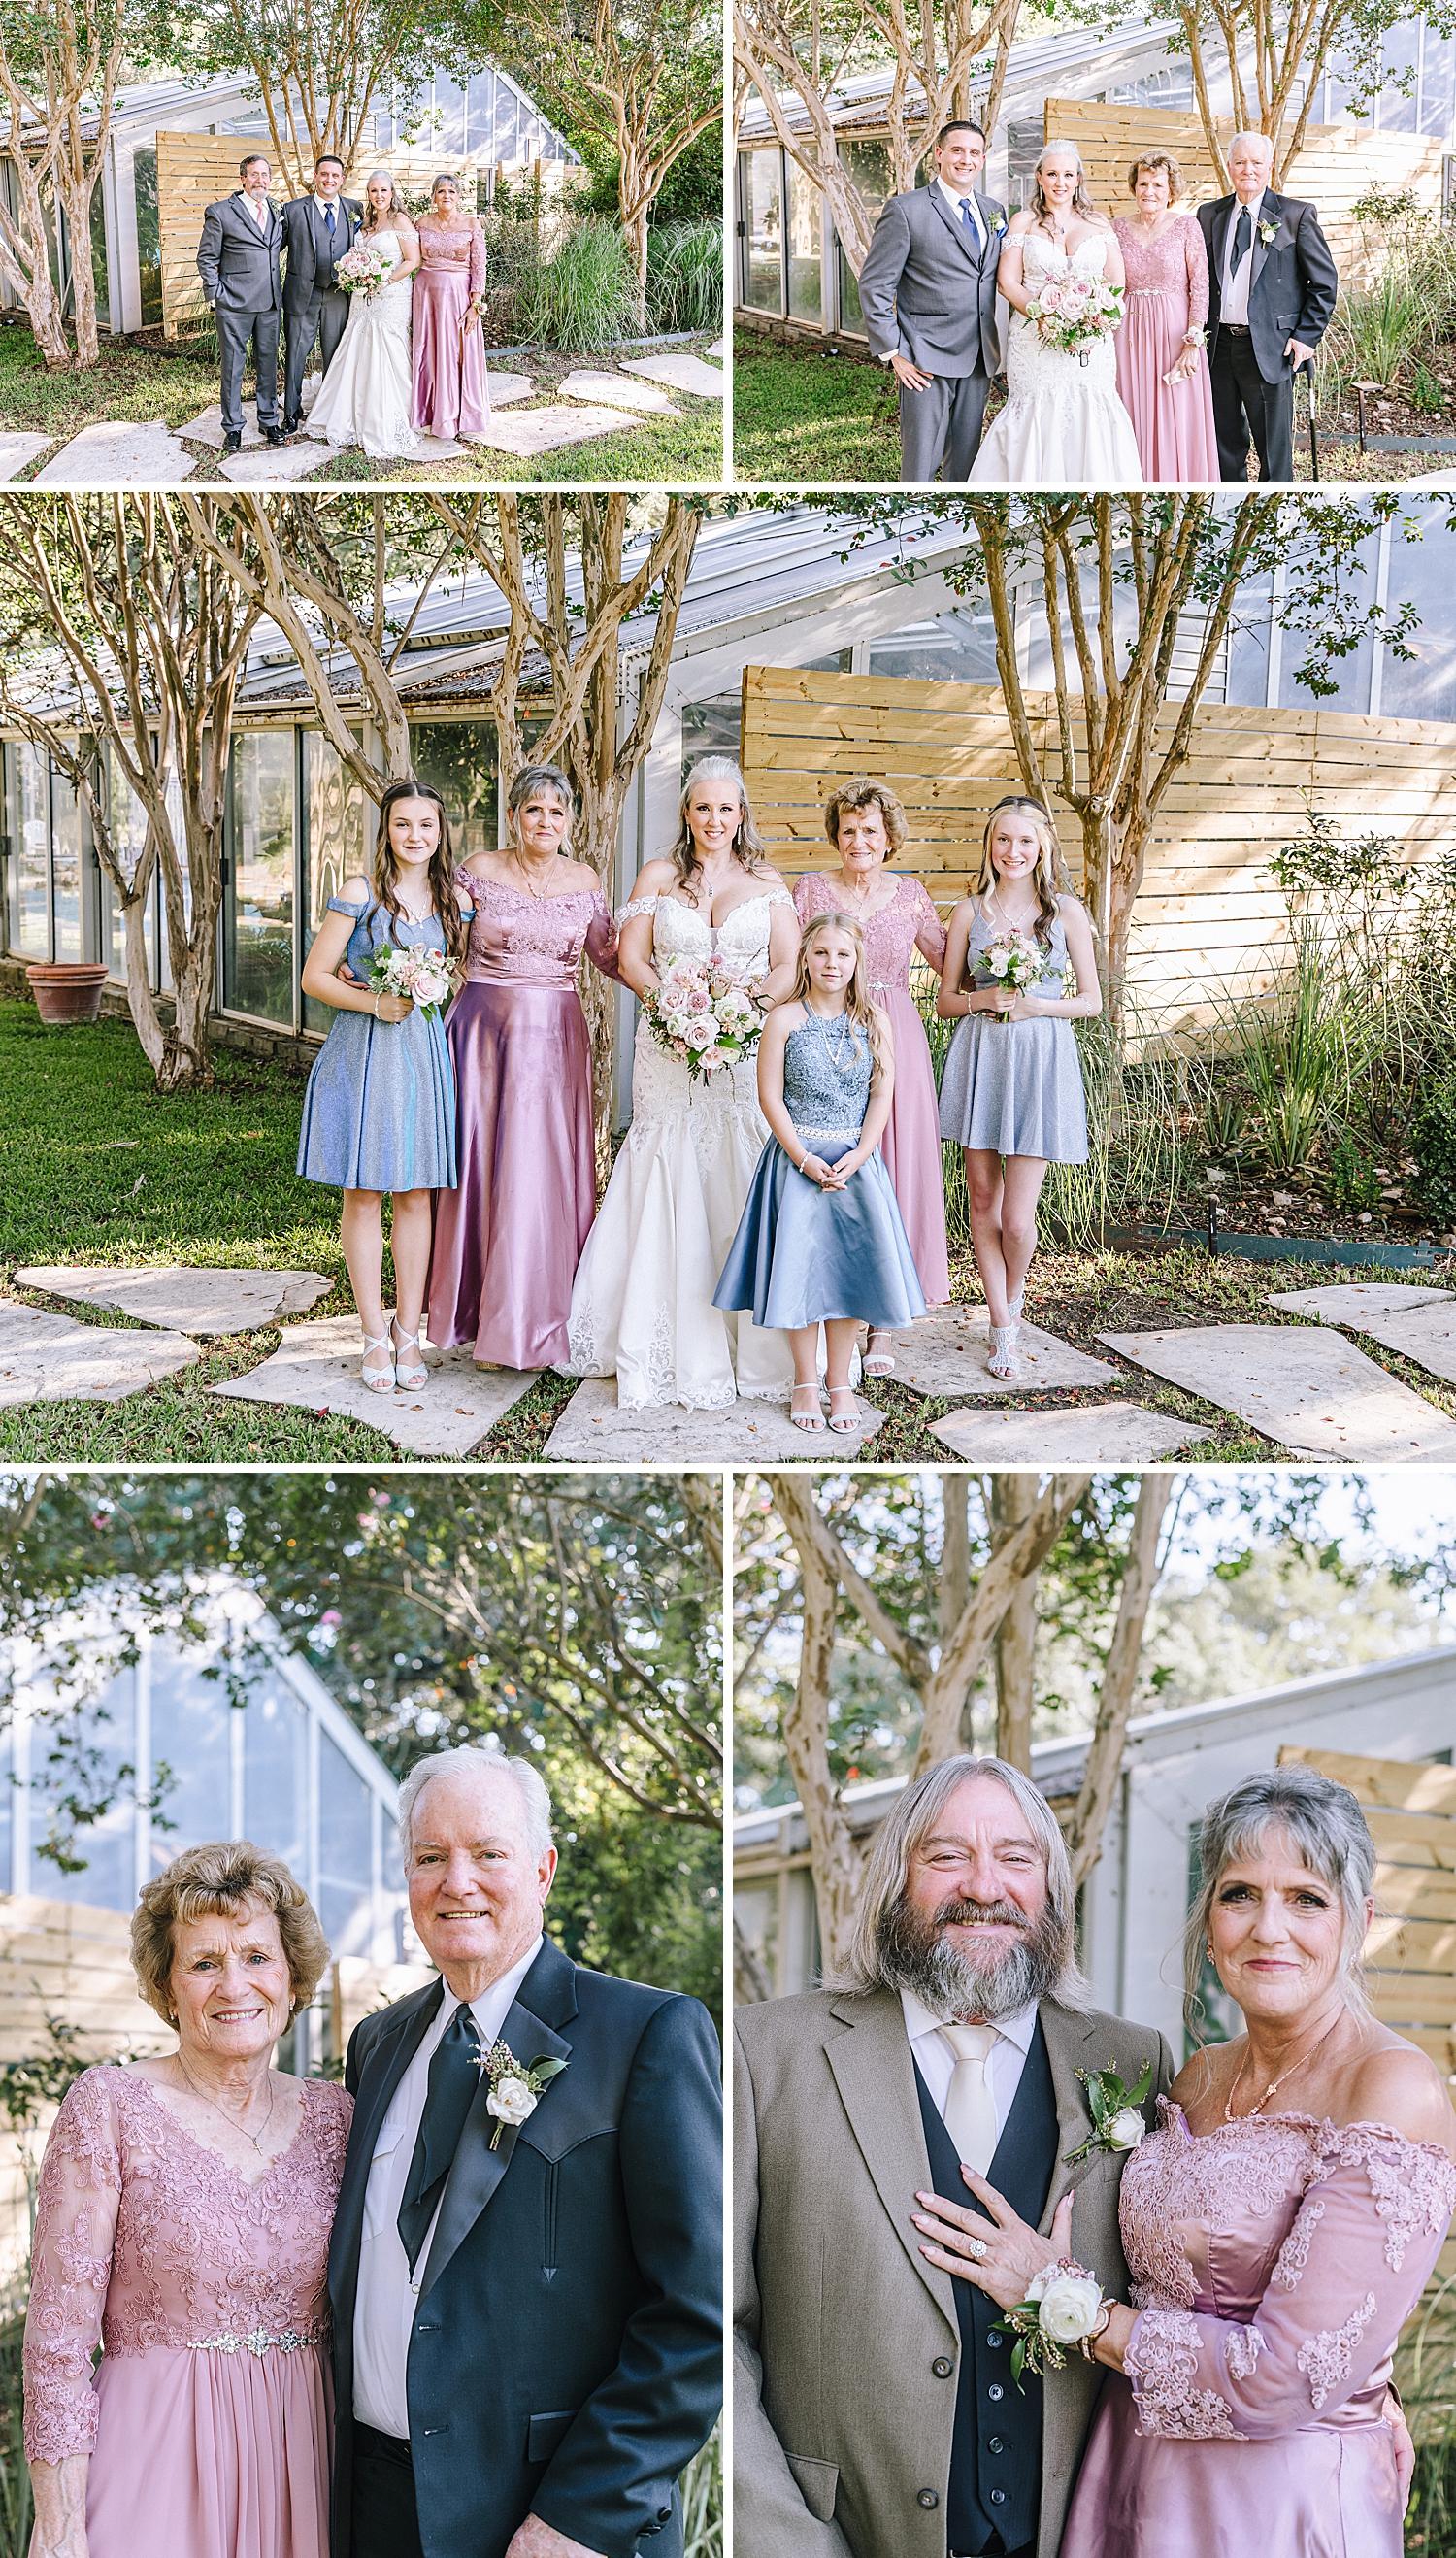 The-Club-at-Garden-Ridge-Military-Wedding-Carly-Barton-Photography_0075.jpg